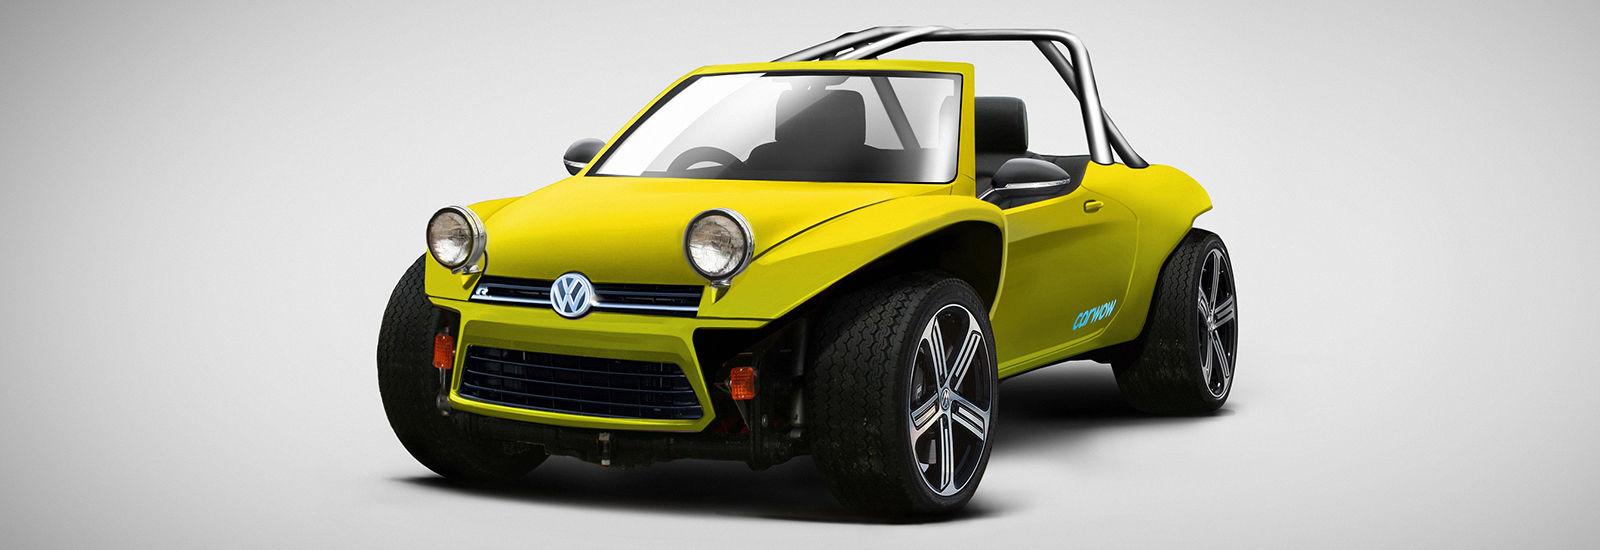 K-carwow-VW-Golf-Buggy-cropped